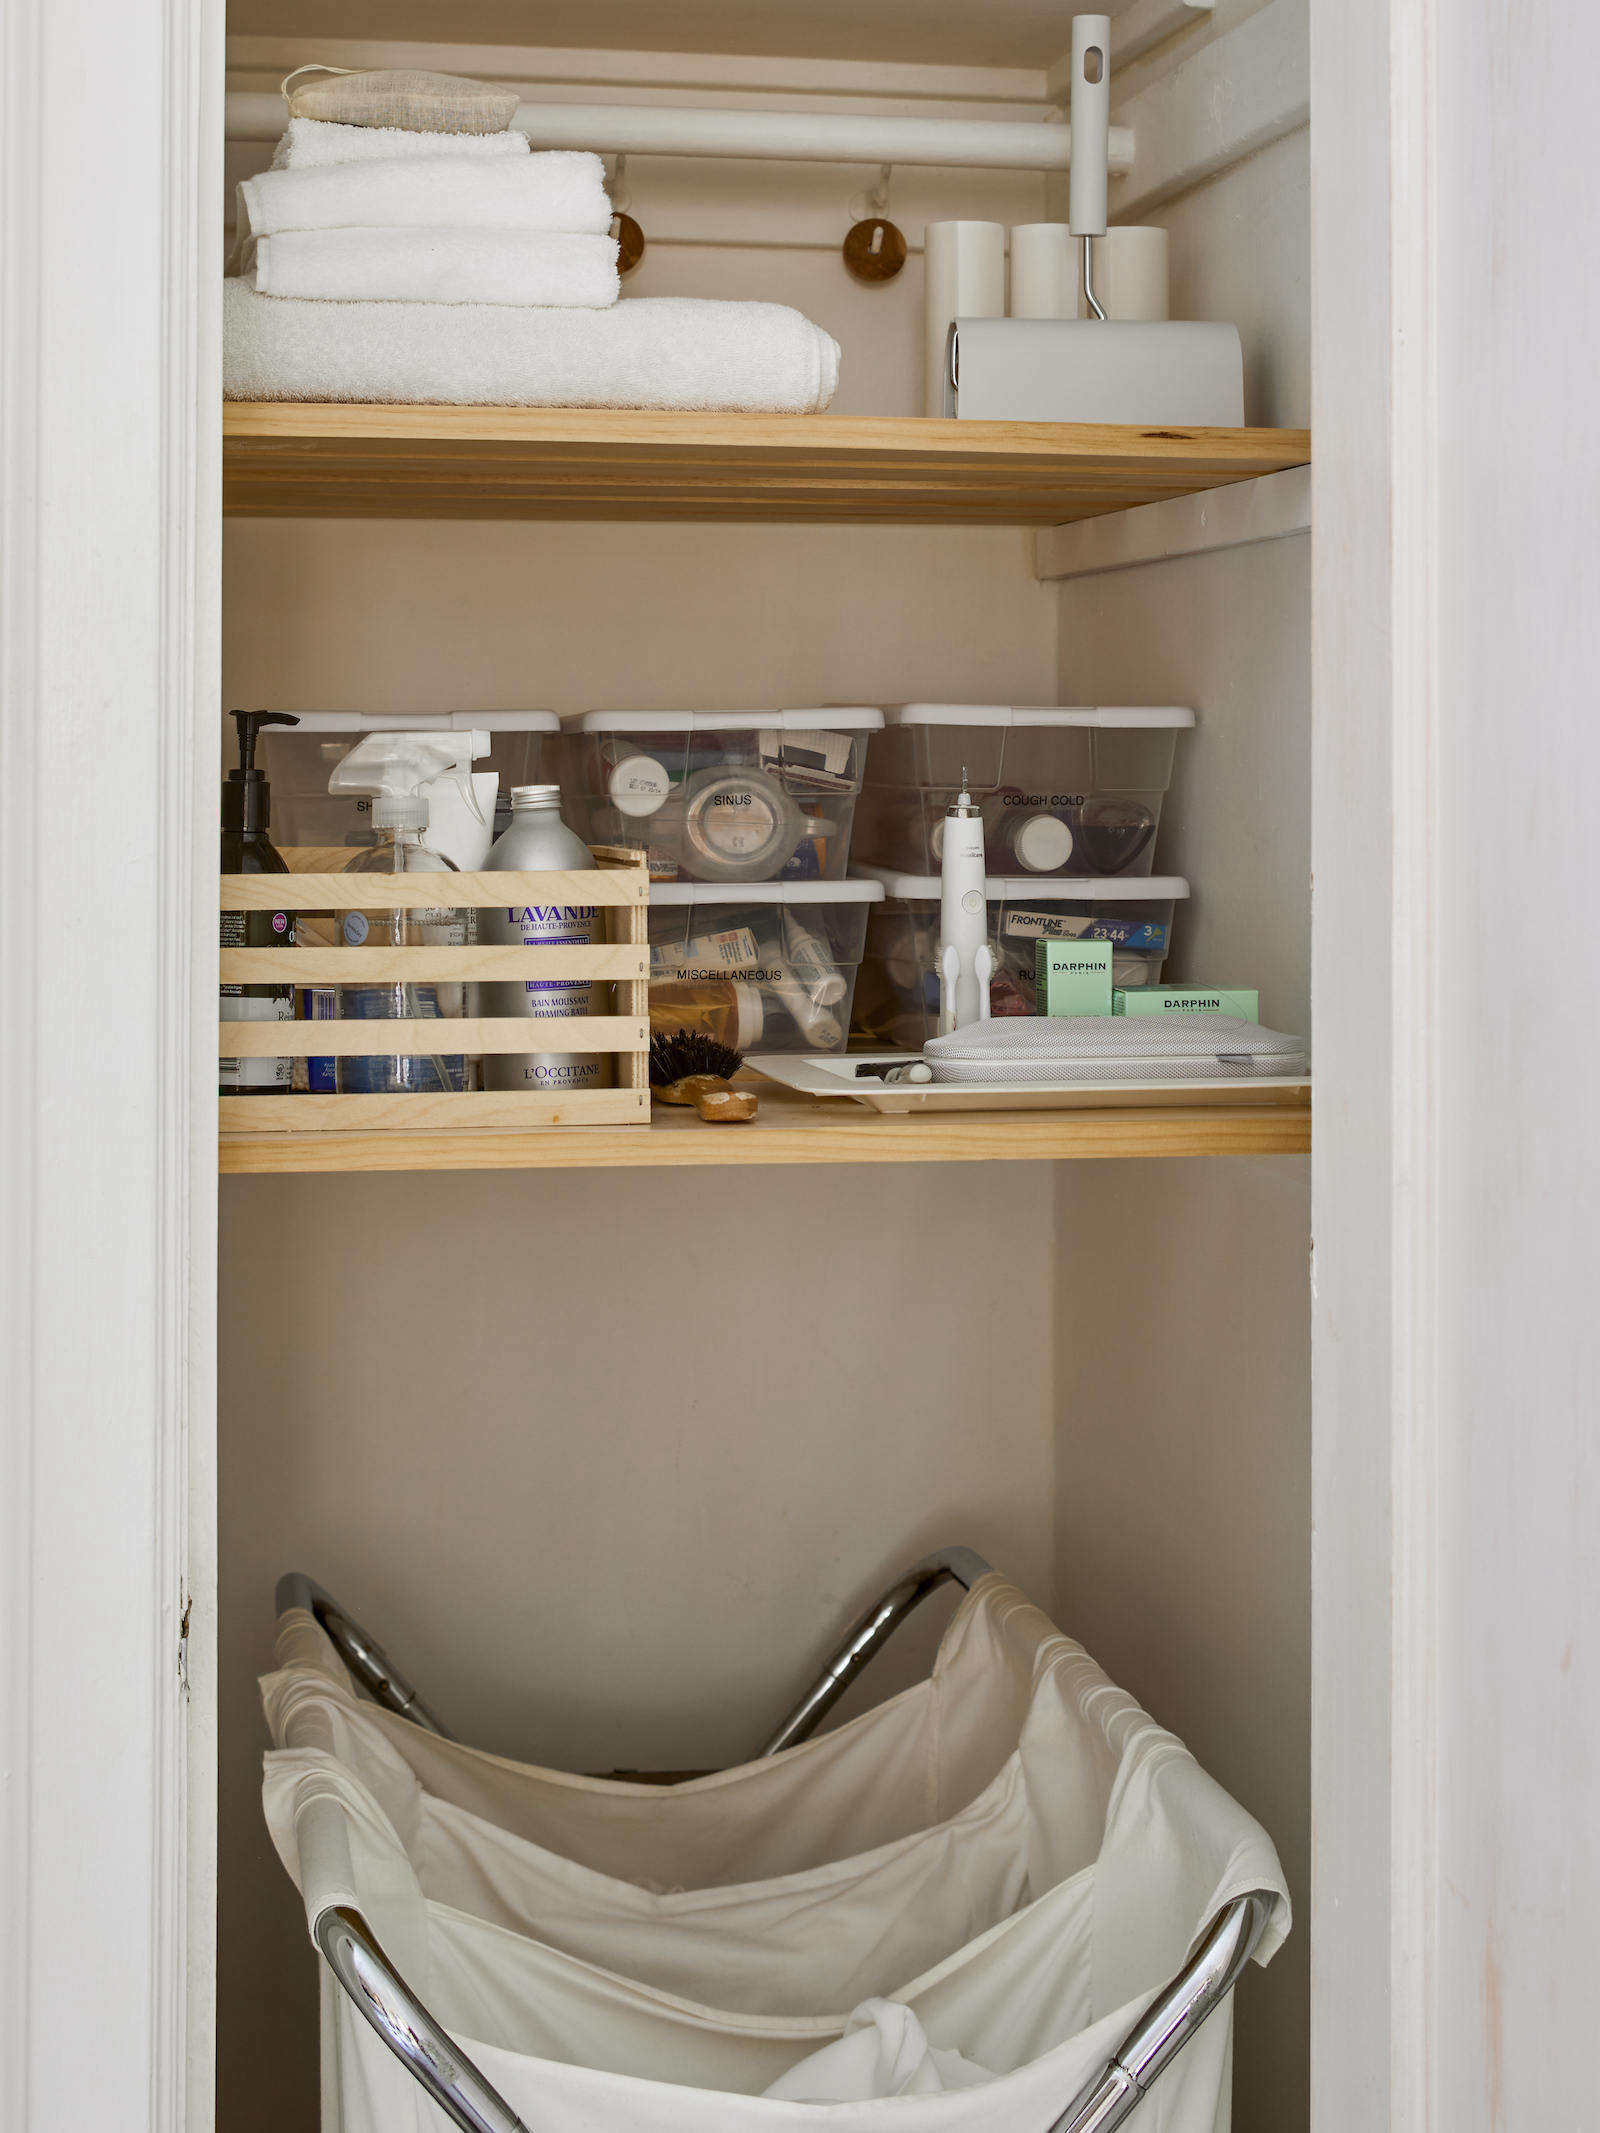 Matthew Axe Jackson Heights Apartment Linen Closet by Eric Piasecki